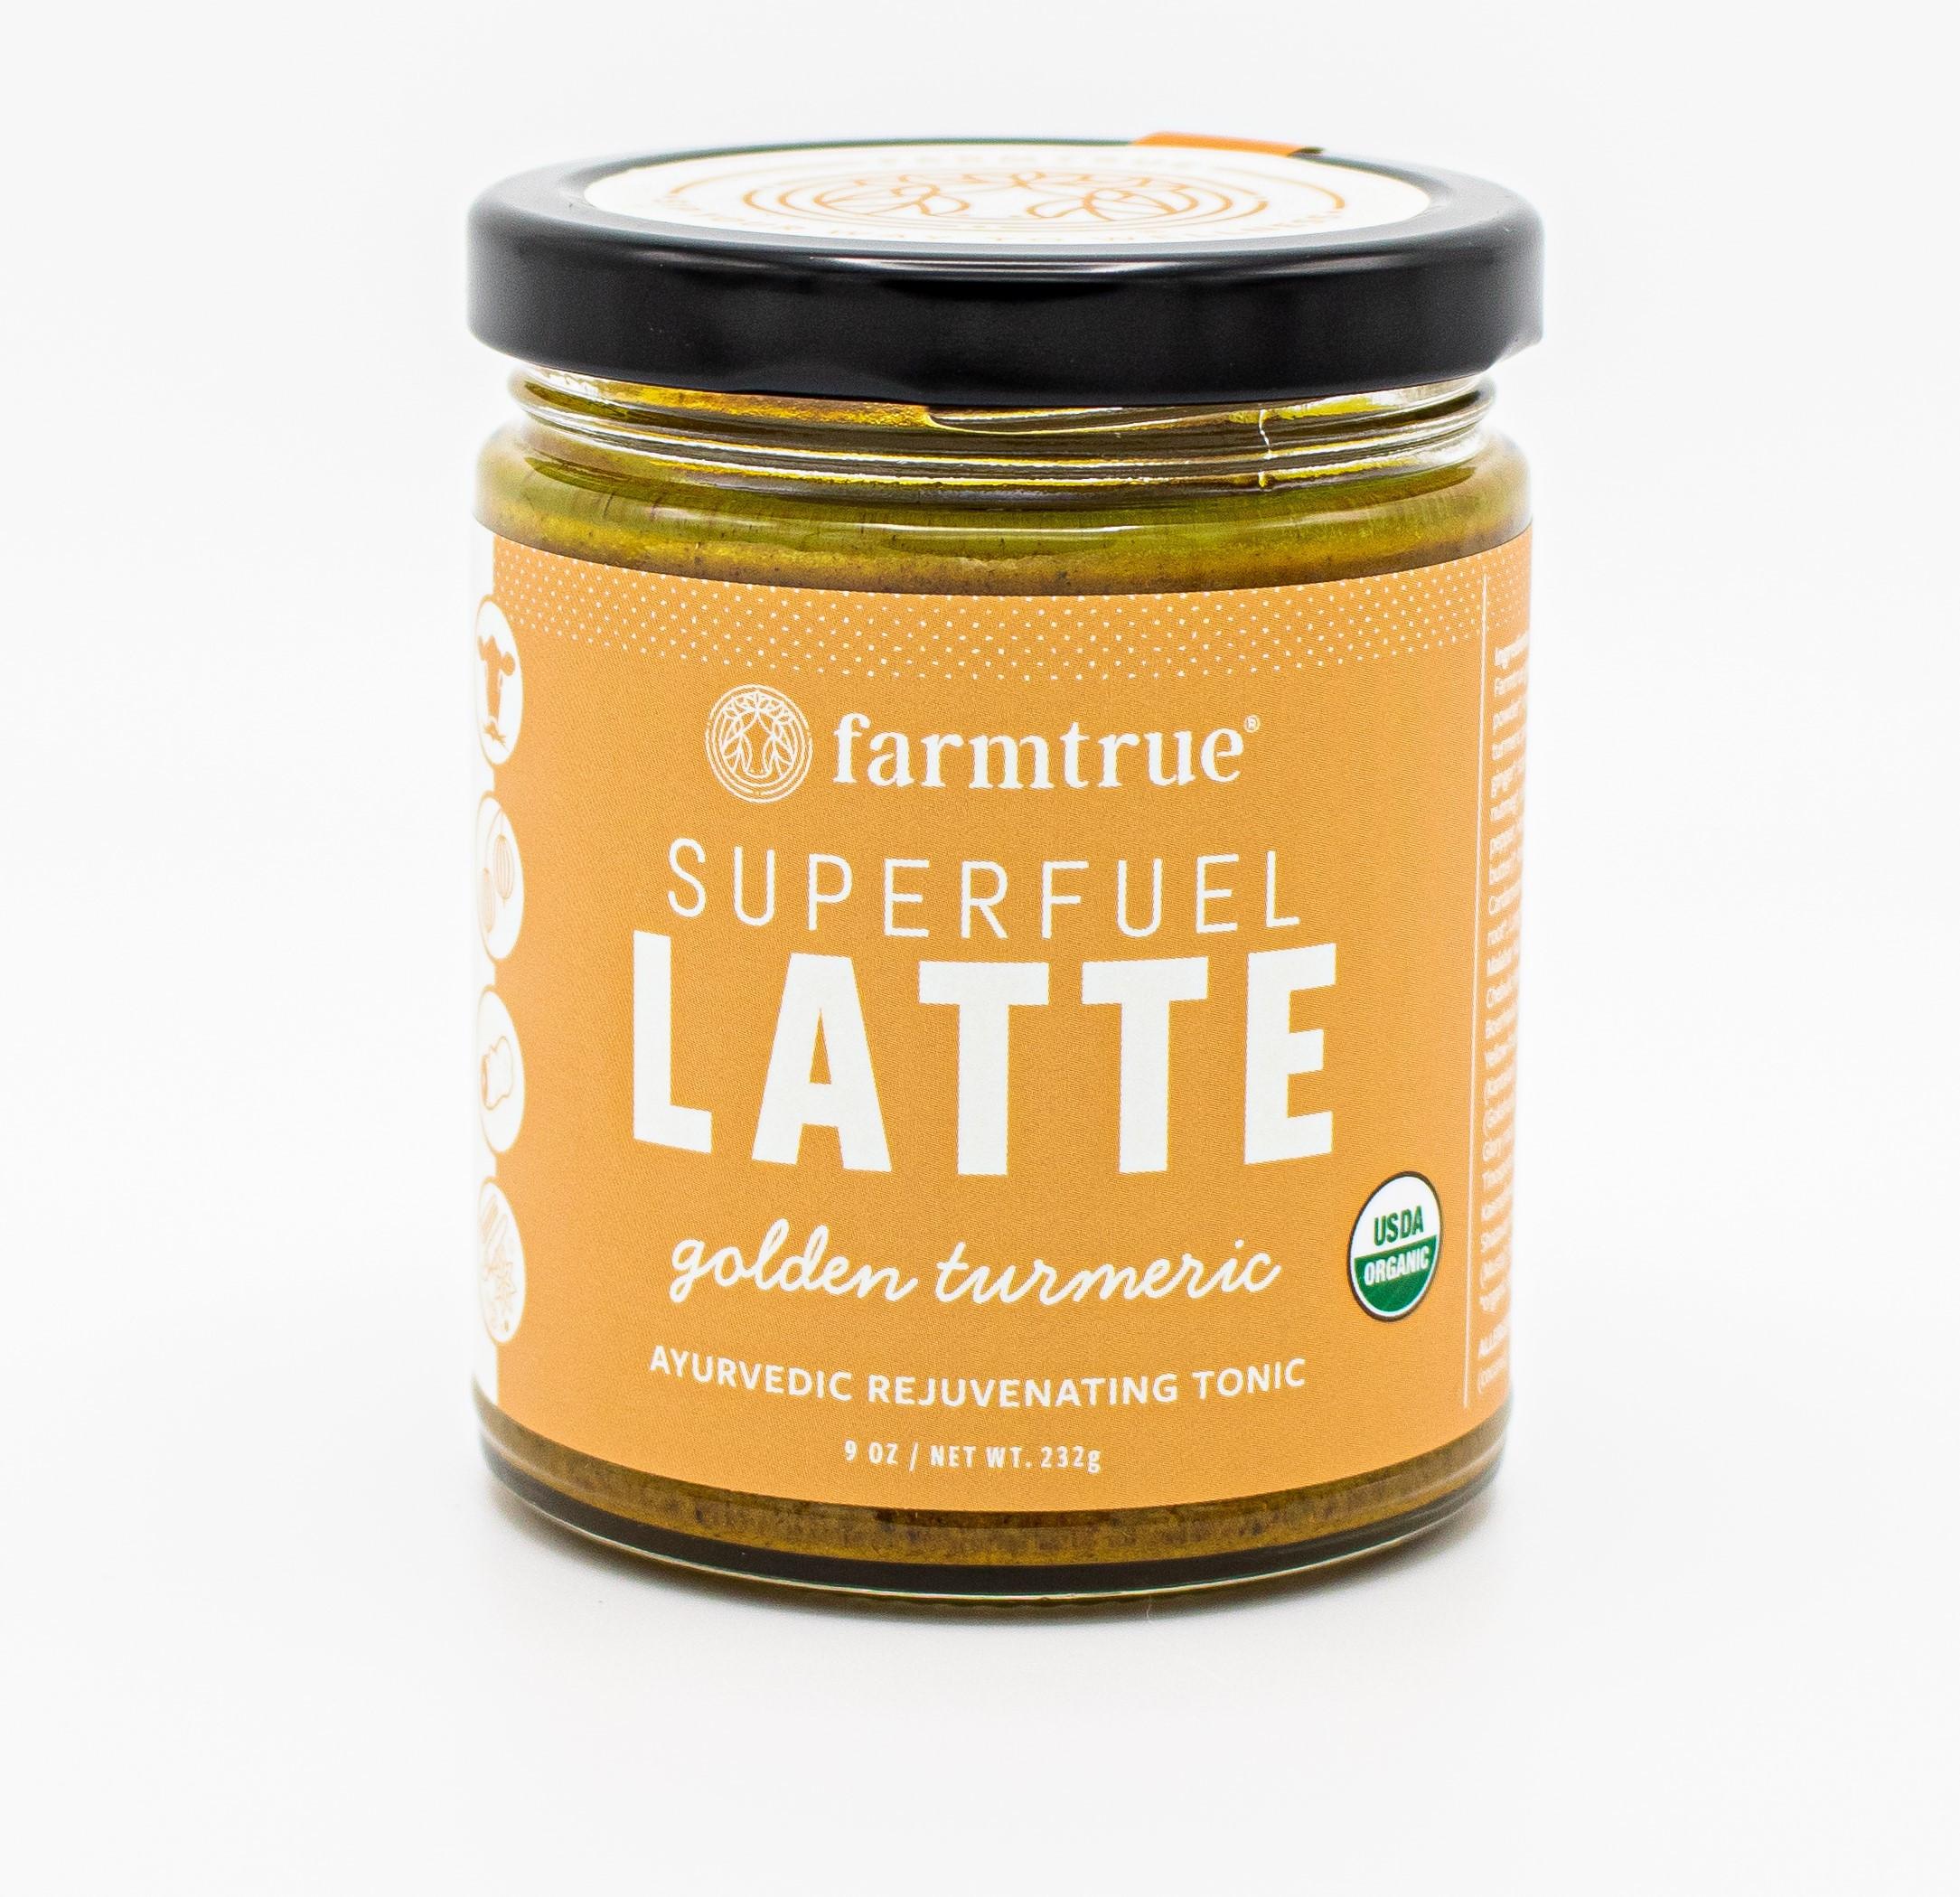 farmtrue: Golden Turmeric Superfuel Latte